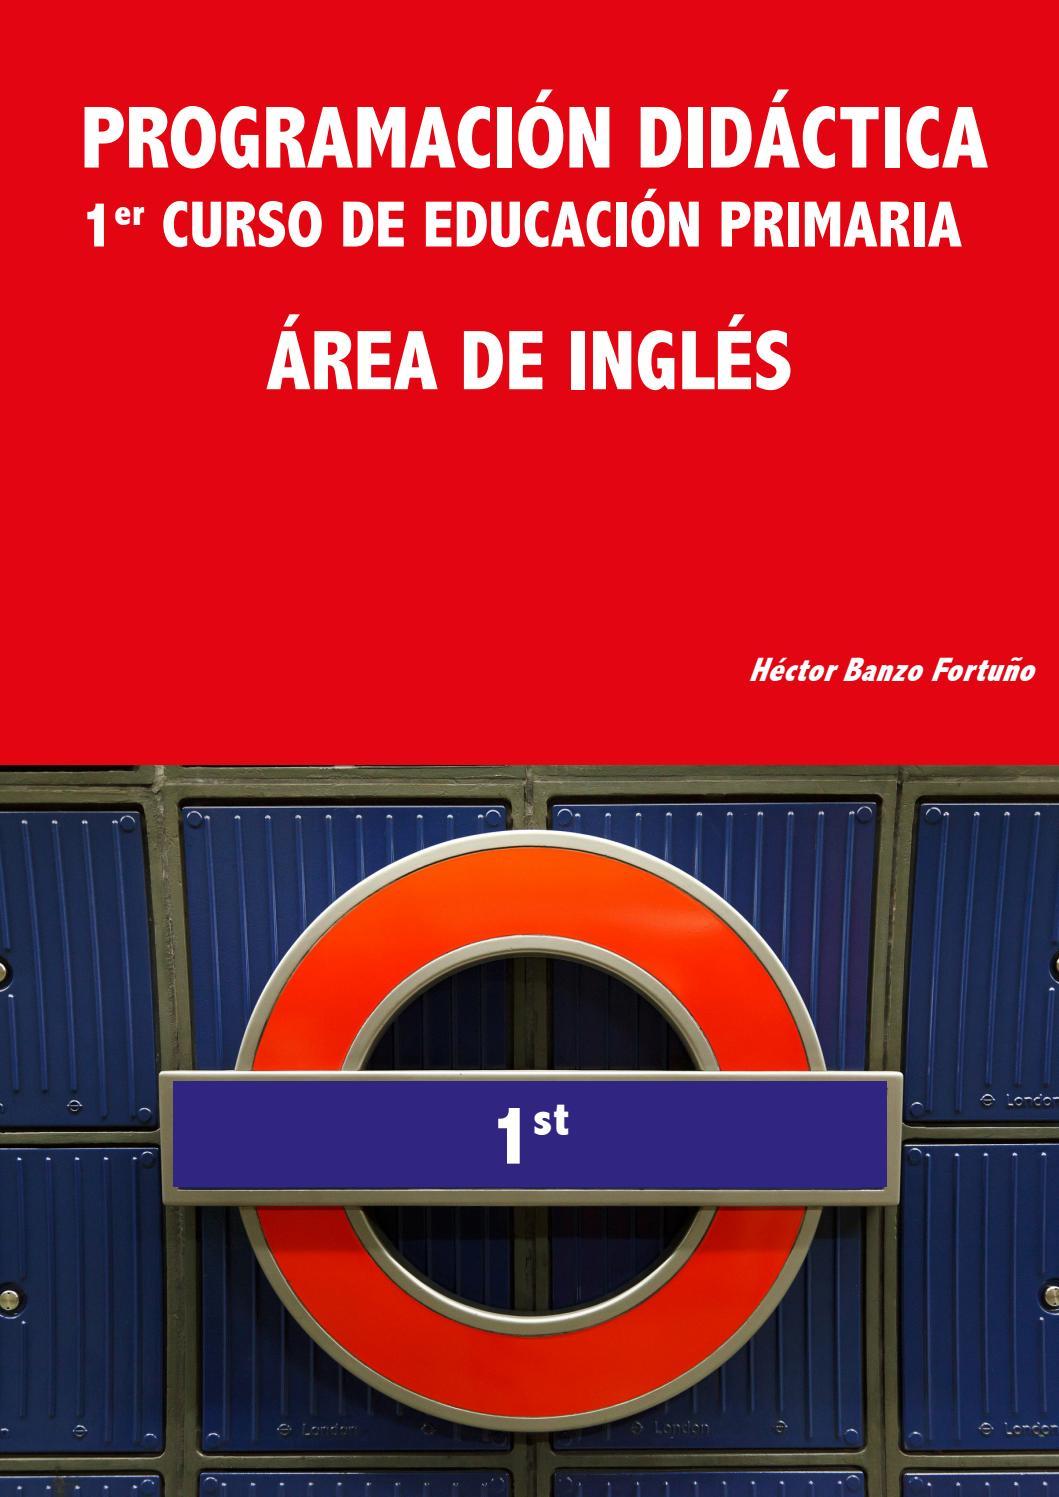 PROGRAMACIÓN DIDÁCTICA  1ER CURSO DE EDUCACIÓN PRIMARIA